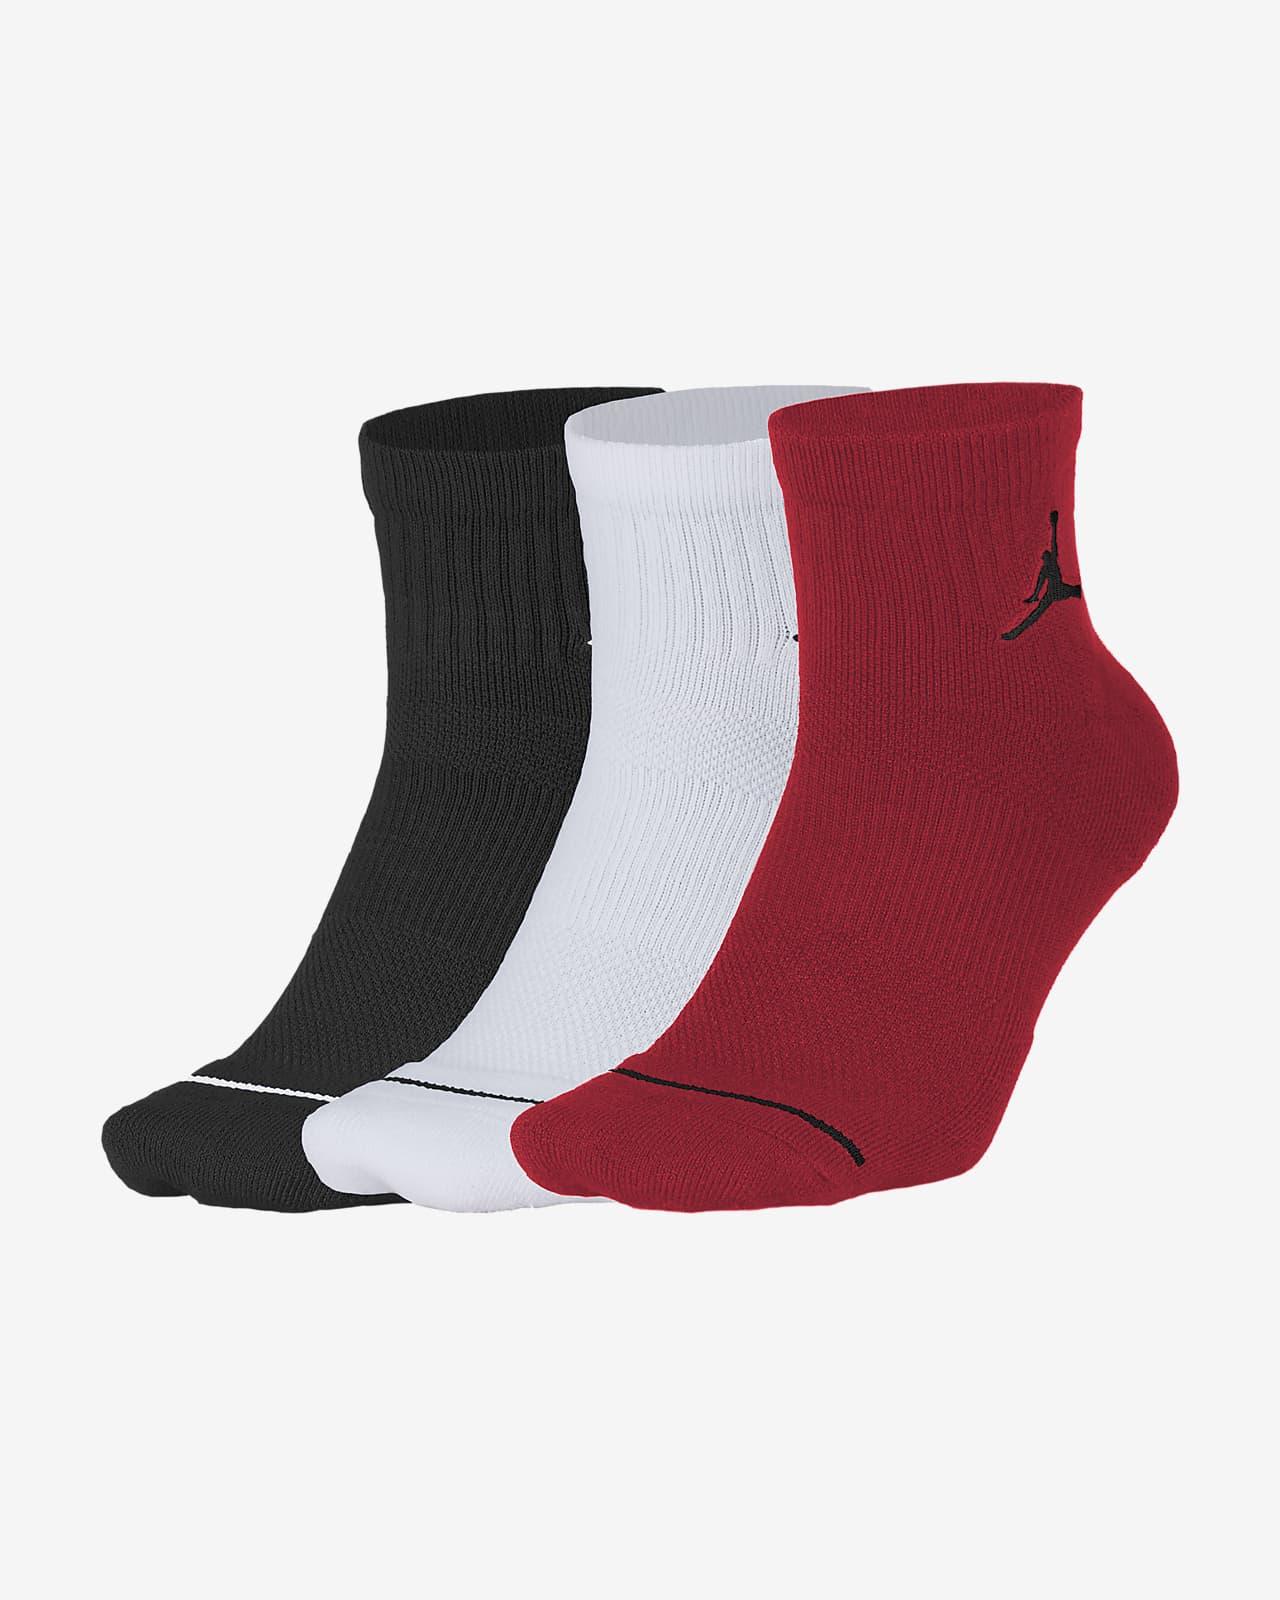 Jordan Everyday Max Ankles Socks (3 Pairs)